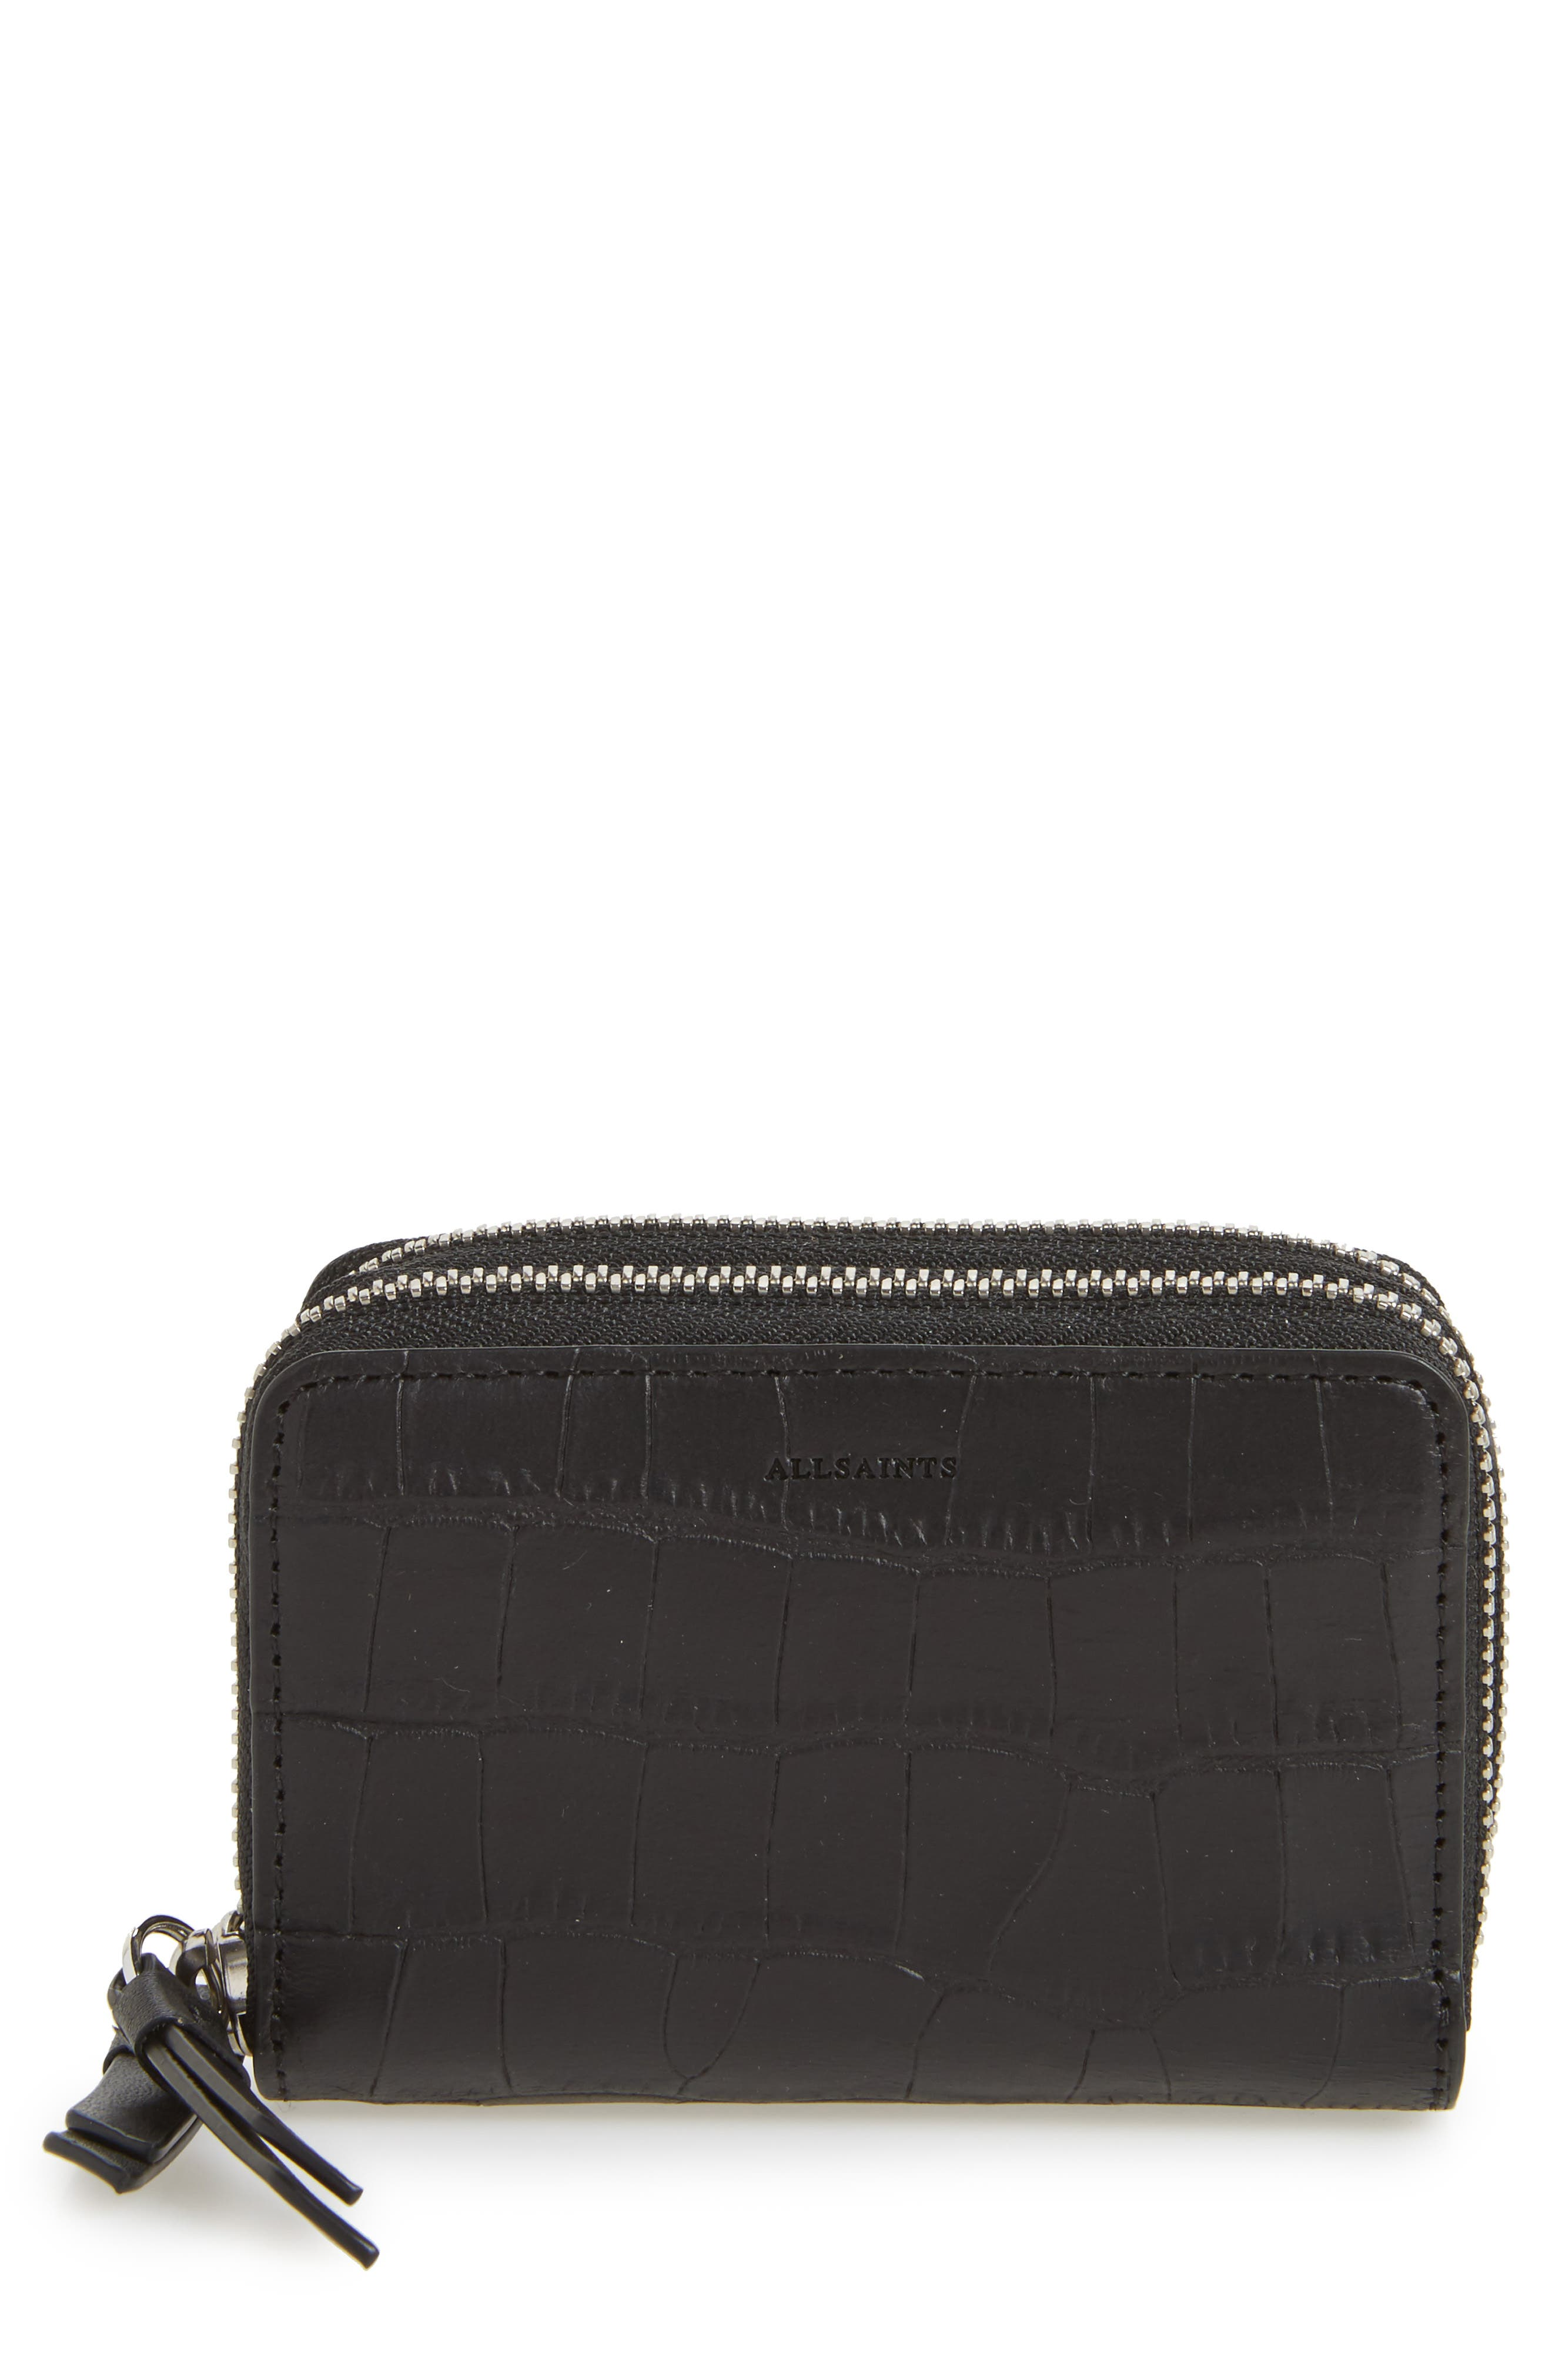 Main Image - ALLSAINTS Fetch Leather Card Holder